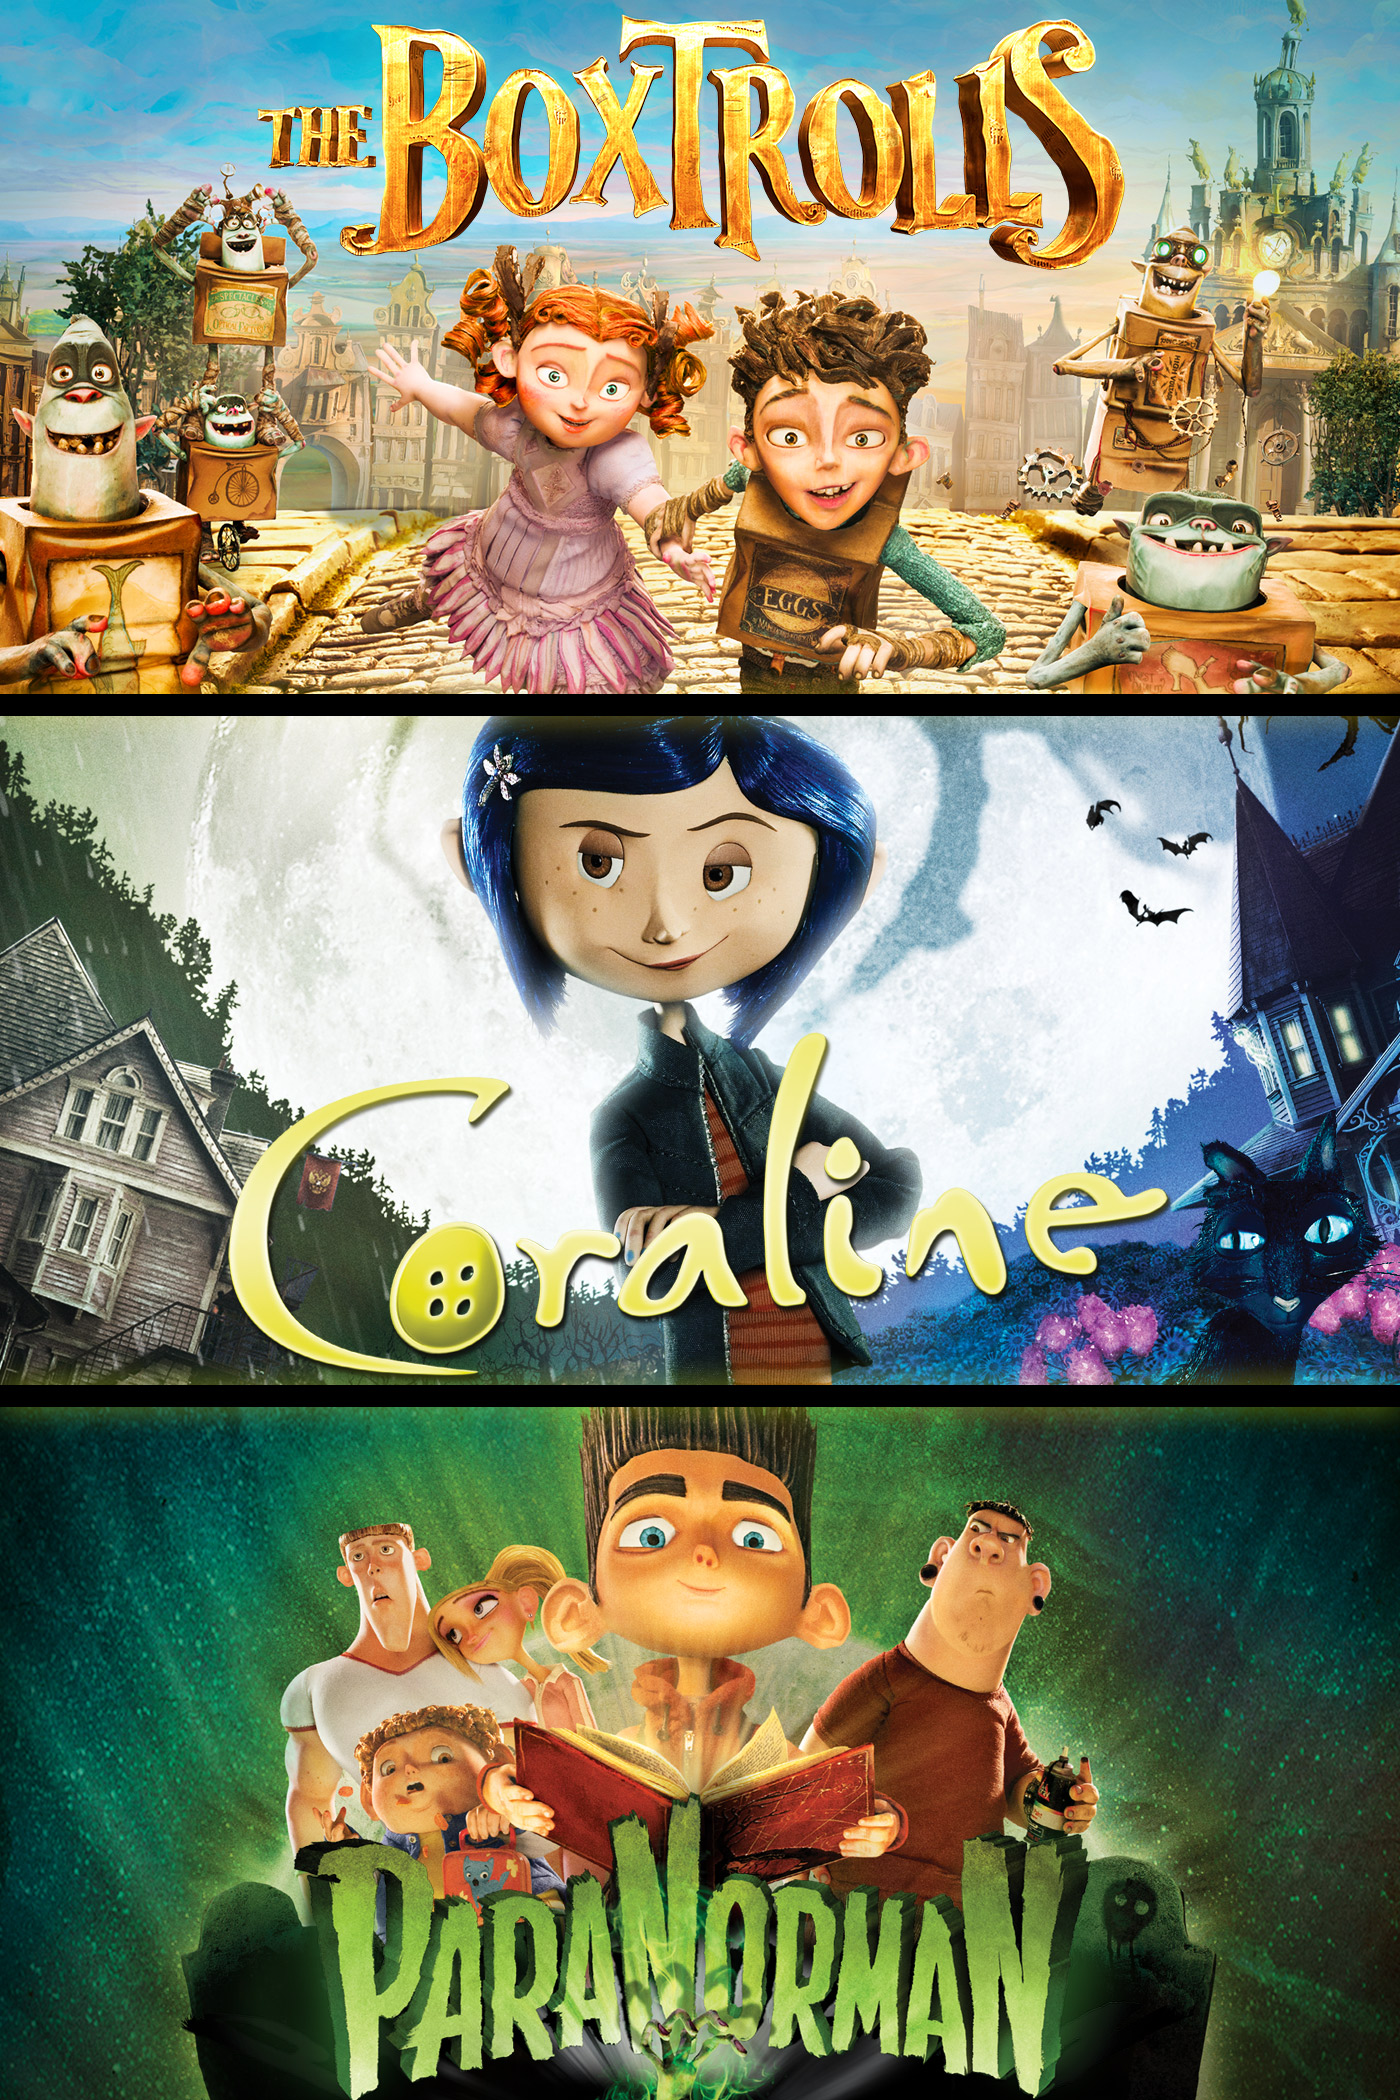 The Boxtrolls / ParaNorman / Coraline Triple Feature